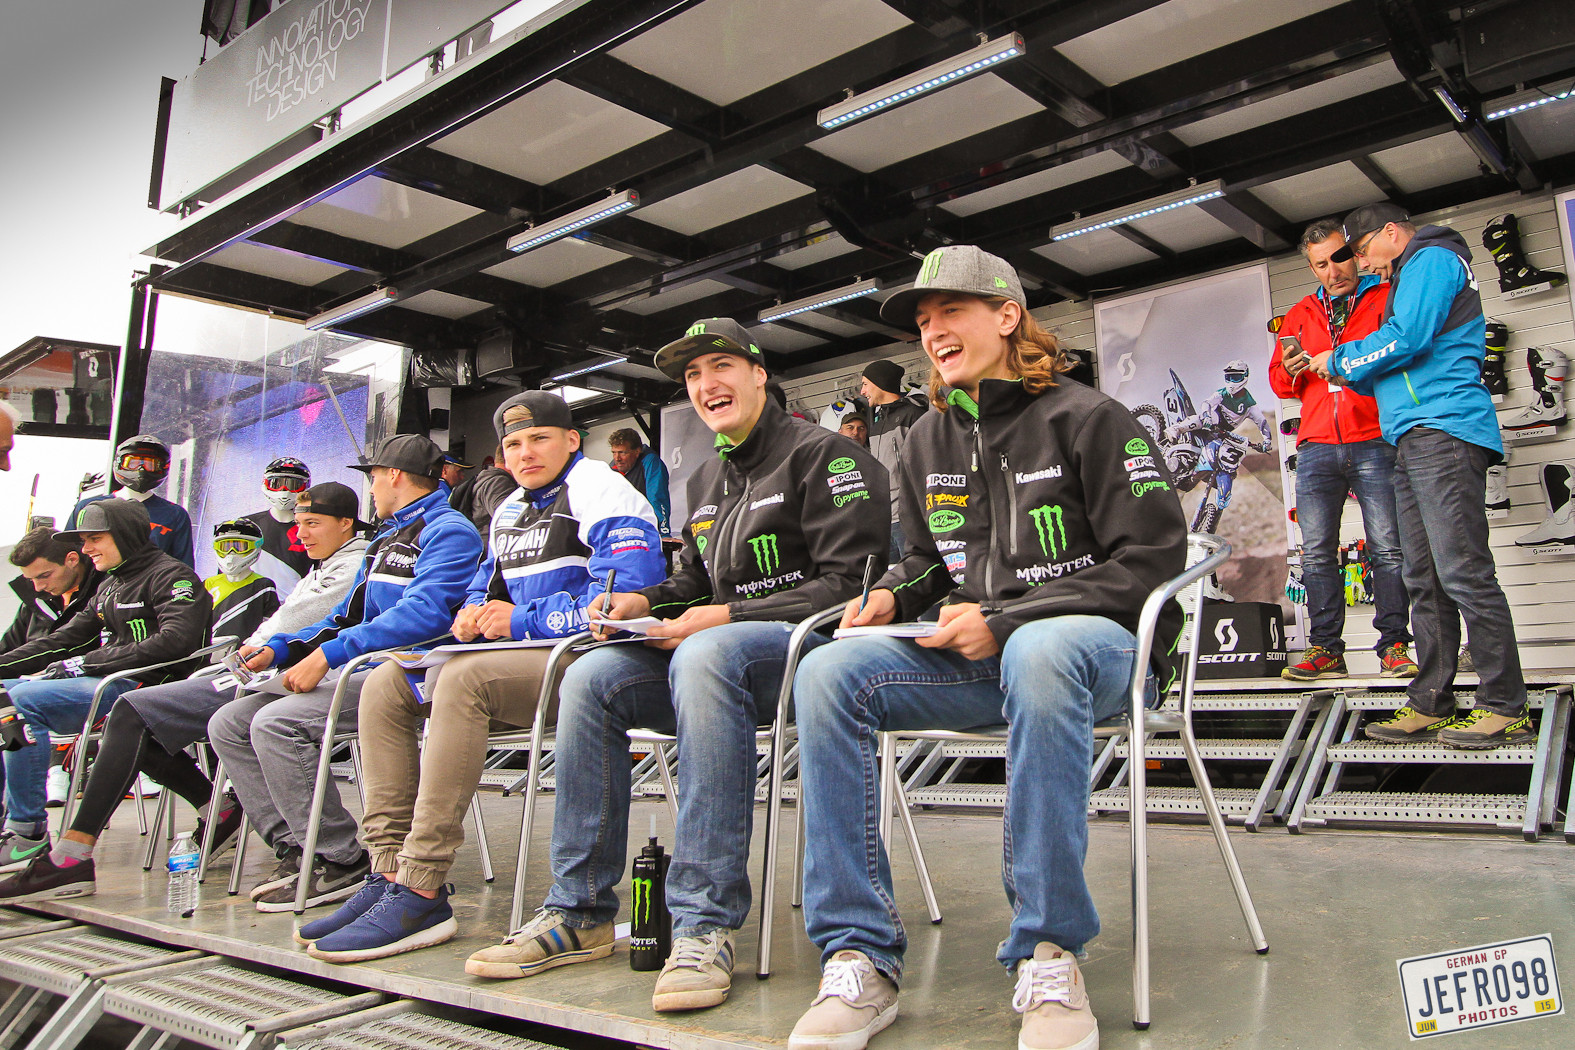 Thomas Covington & Petar Petrov - Photo Blast: MXGP of Germany - Motocross Pictures - Vital MX